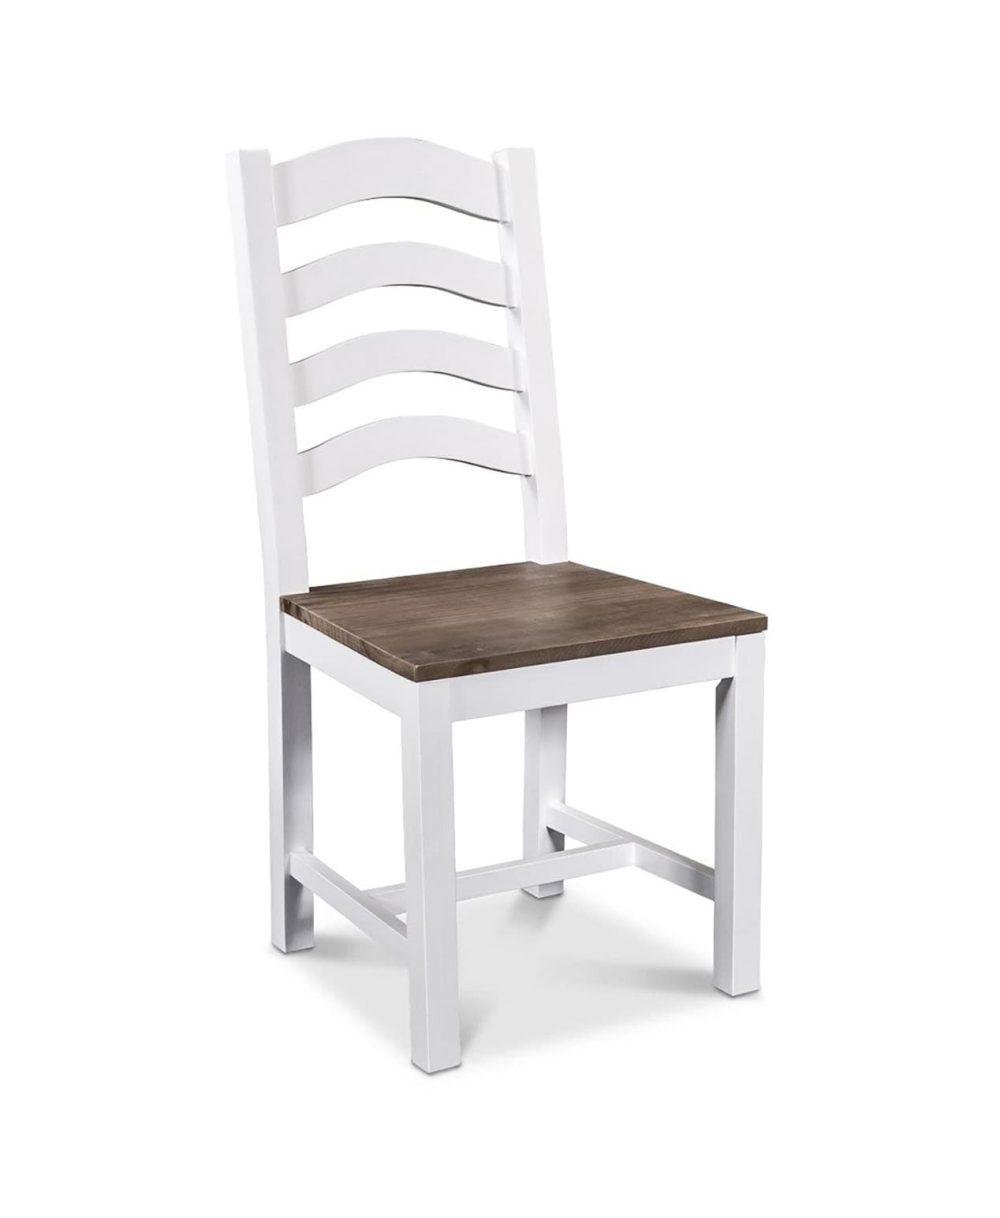 Wallice Chair